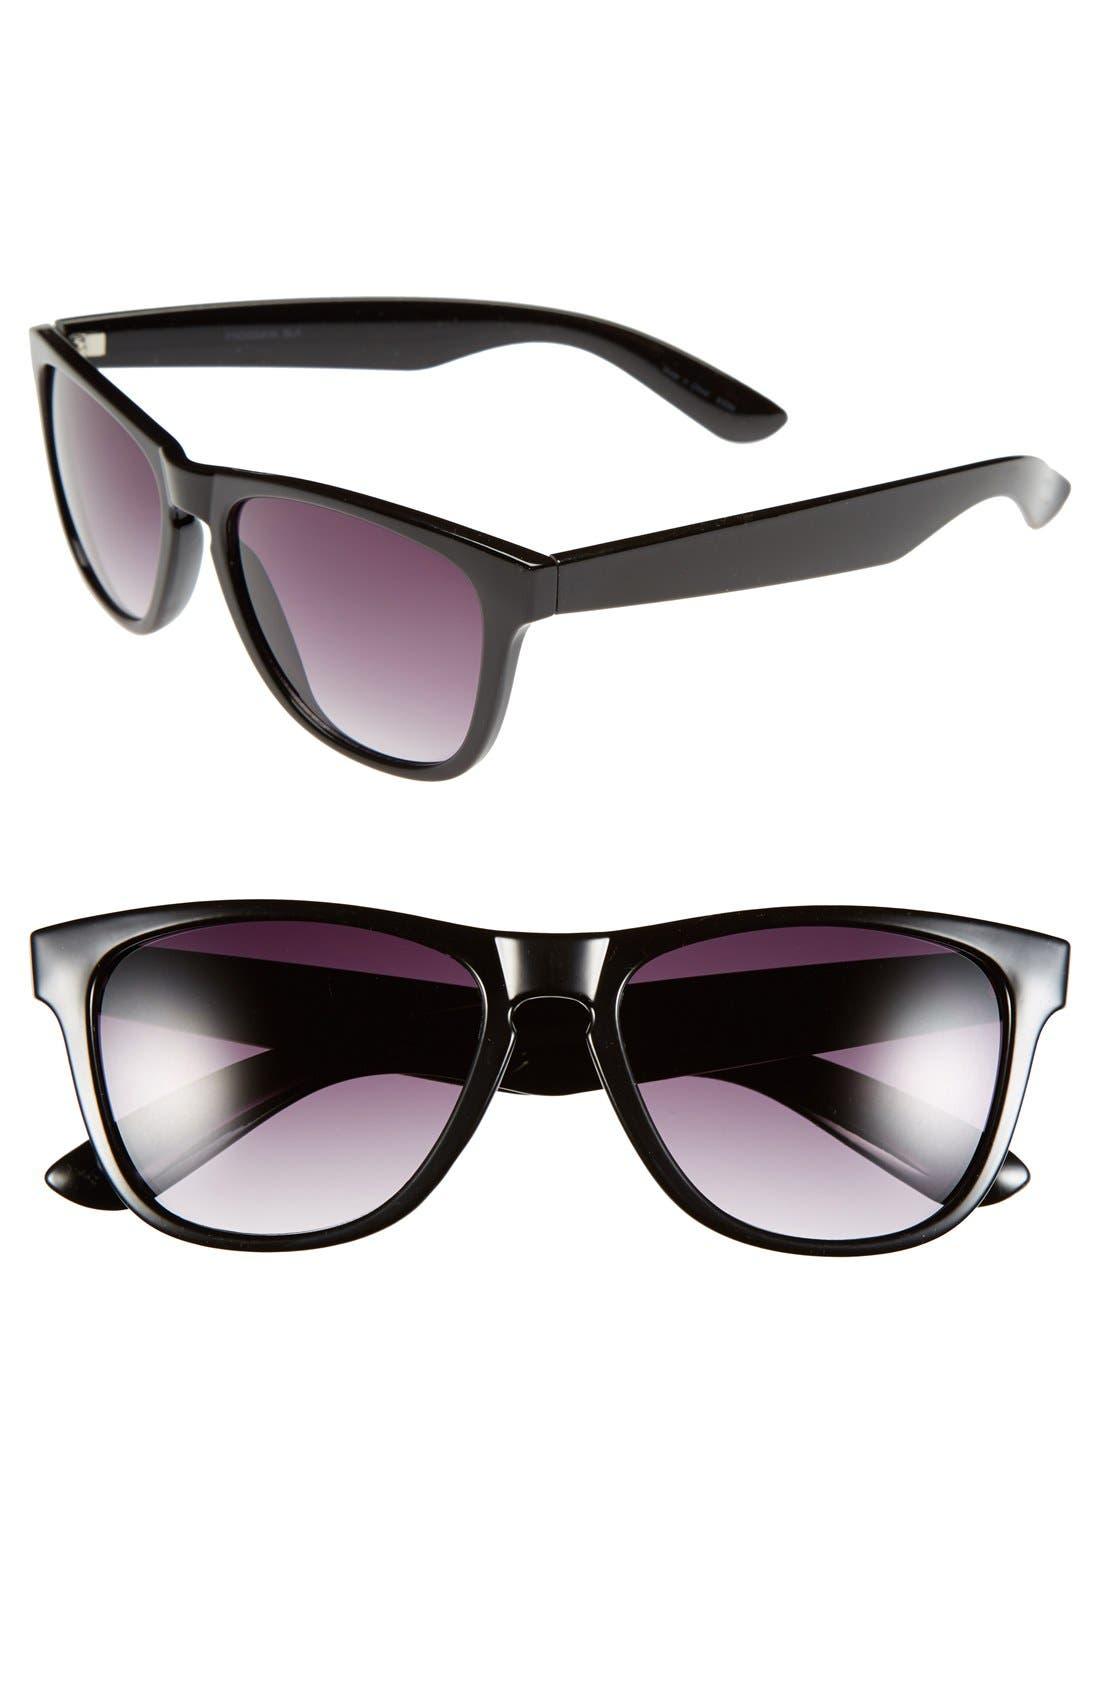 Main Image - Outlook Eyewear 'Frogskin' 55mm Sunglasses